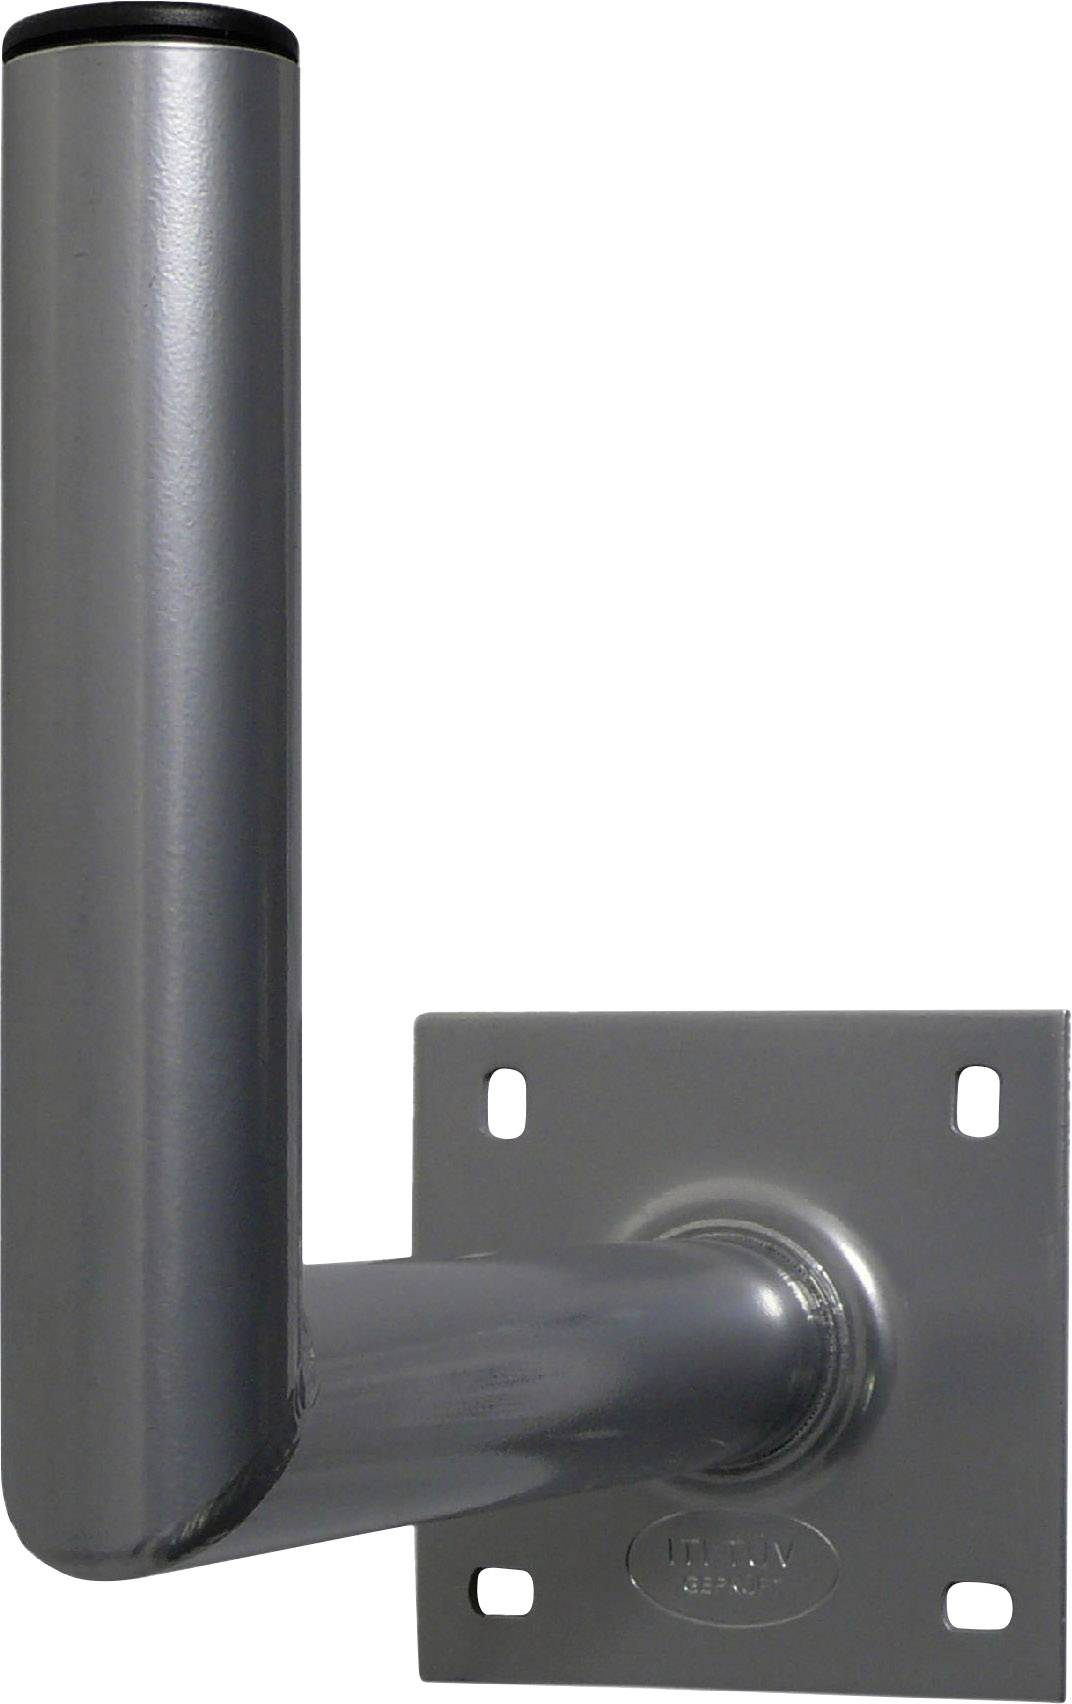 SAT stojan A.S. SAT 10135, 35 cm, Ø do 90 cm, hliník, stříbrná